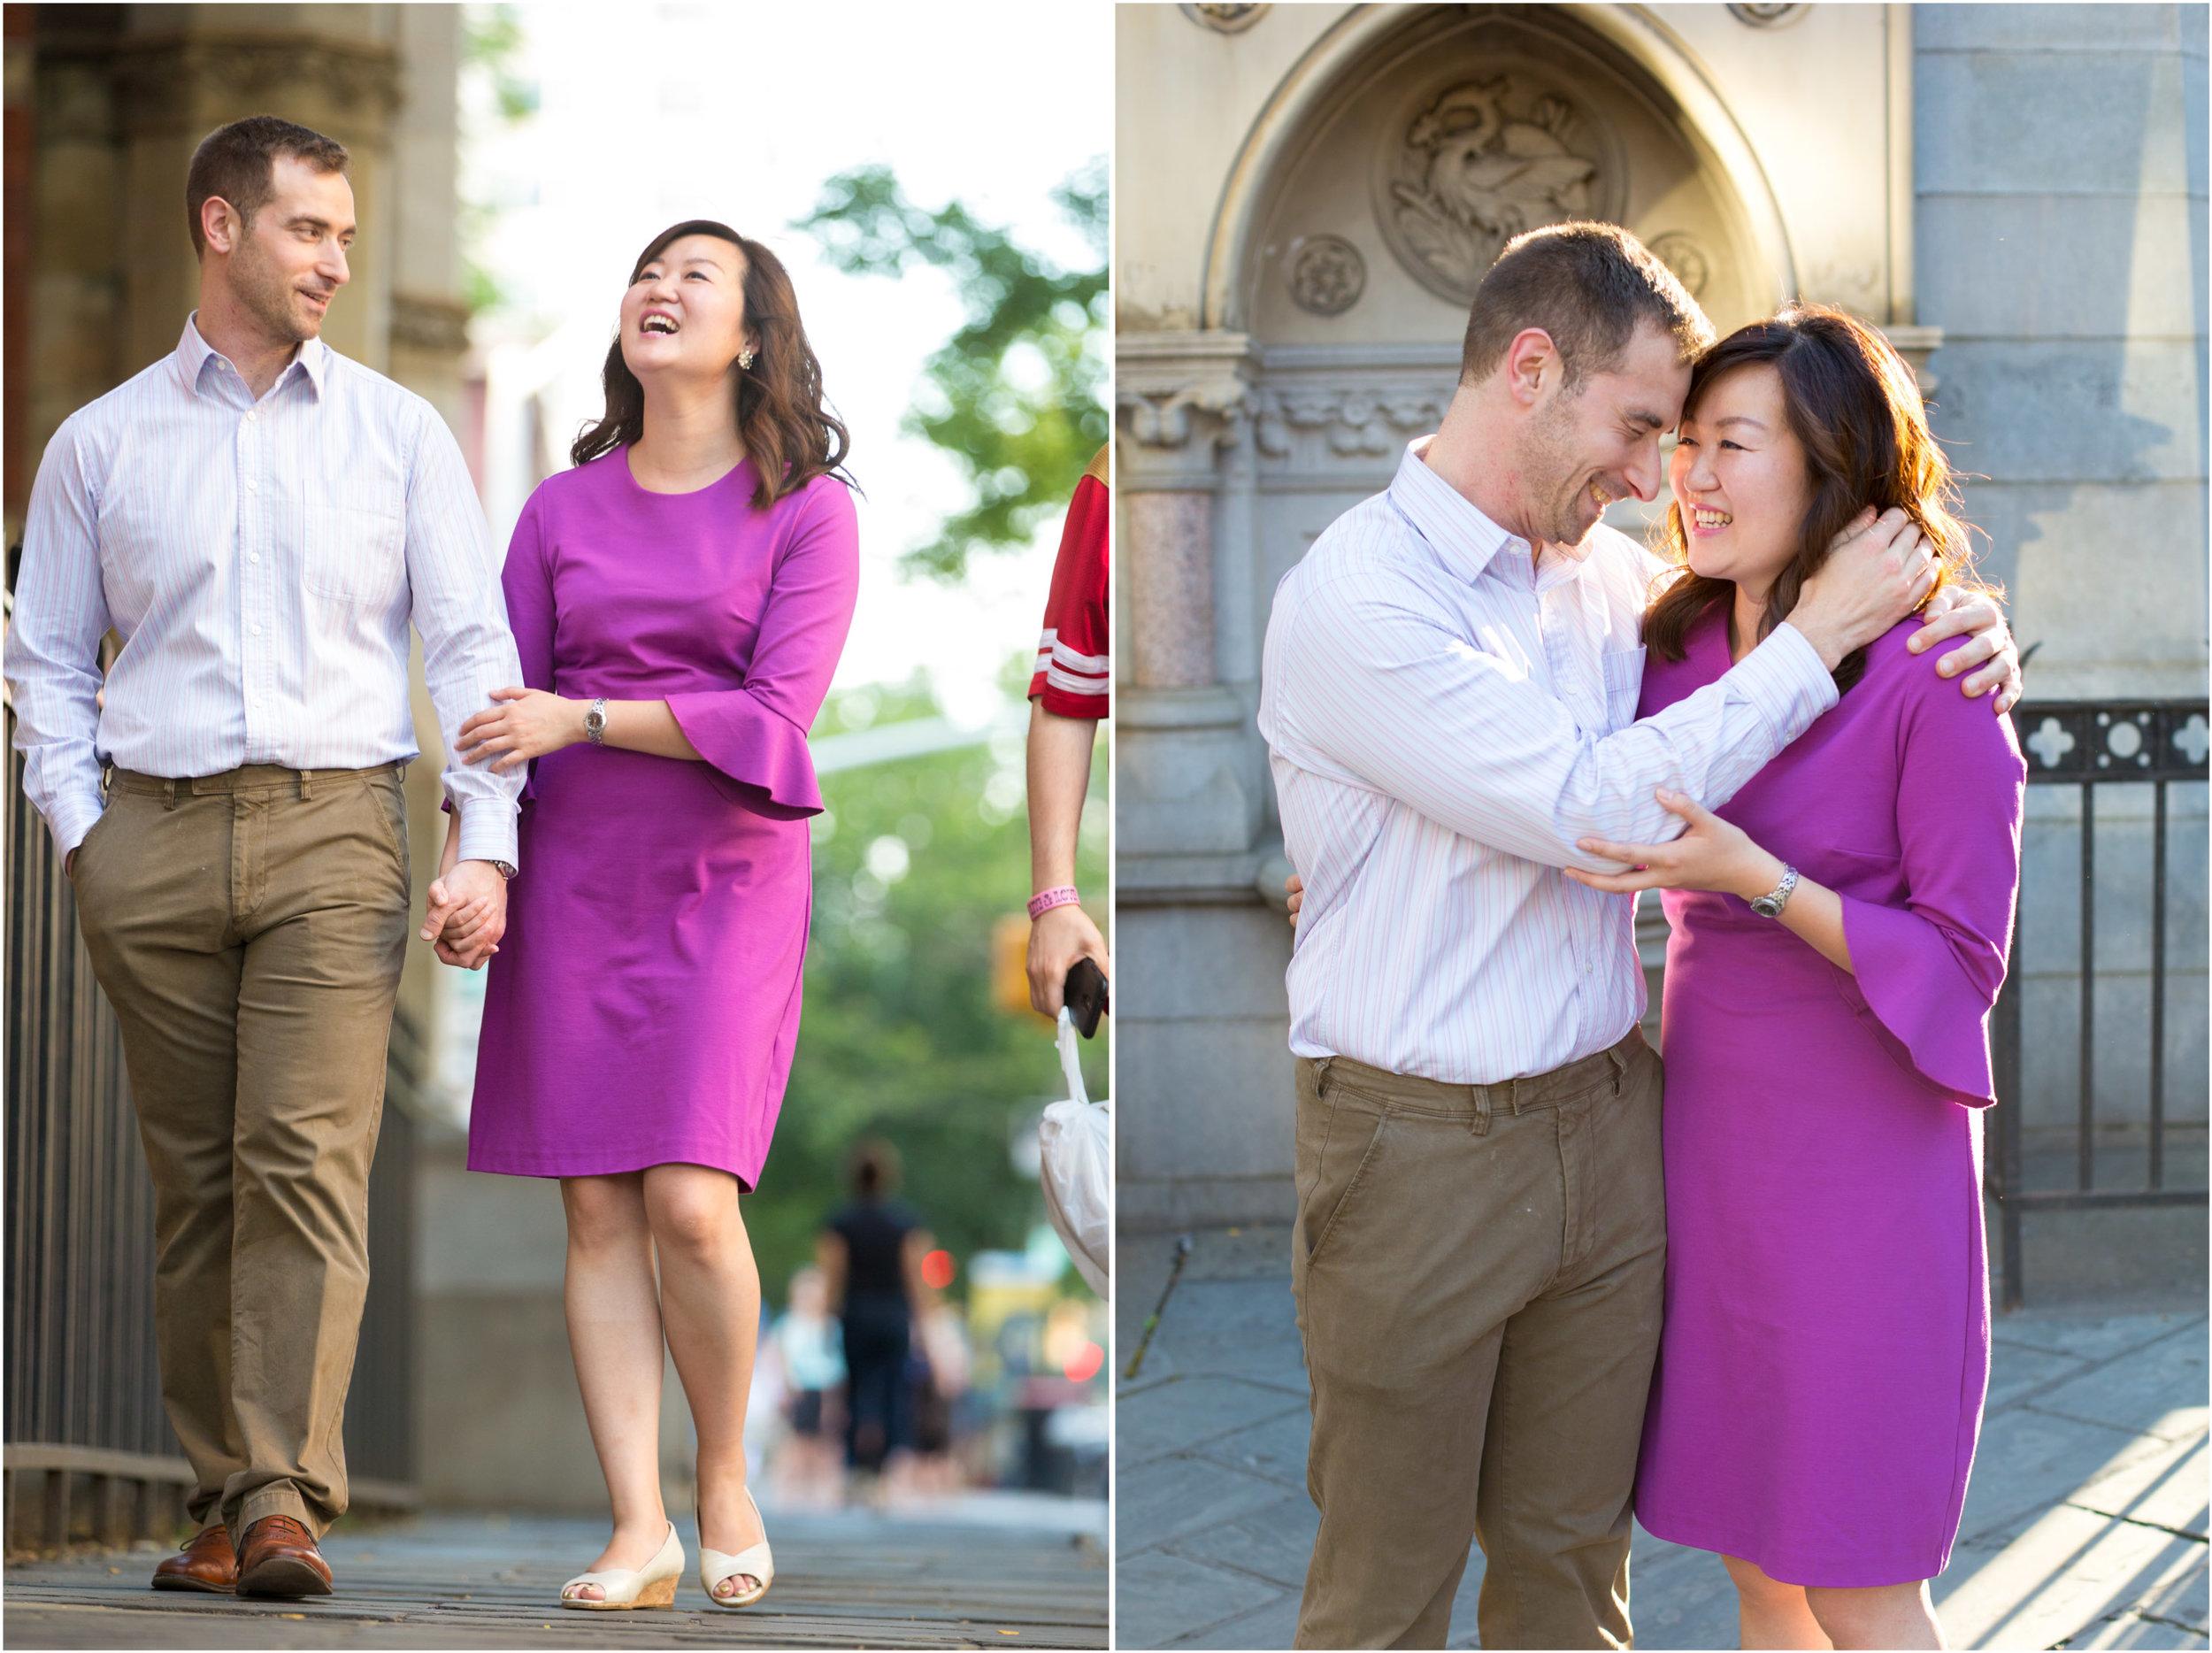 West Village Washington Square Park NYC Marriage Engagement Photo Session Shoot-1.jpg